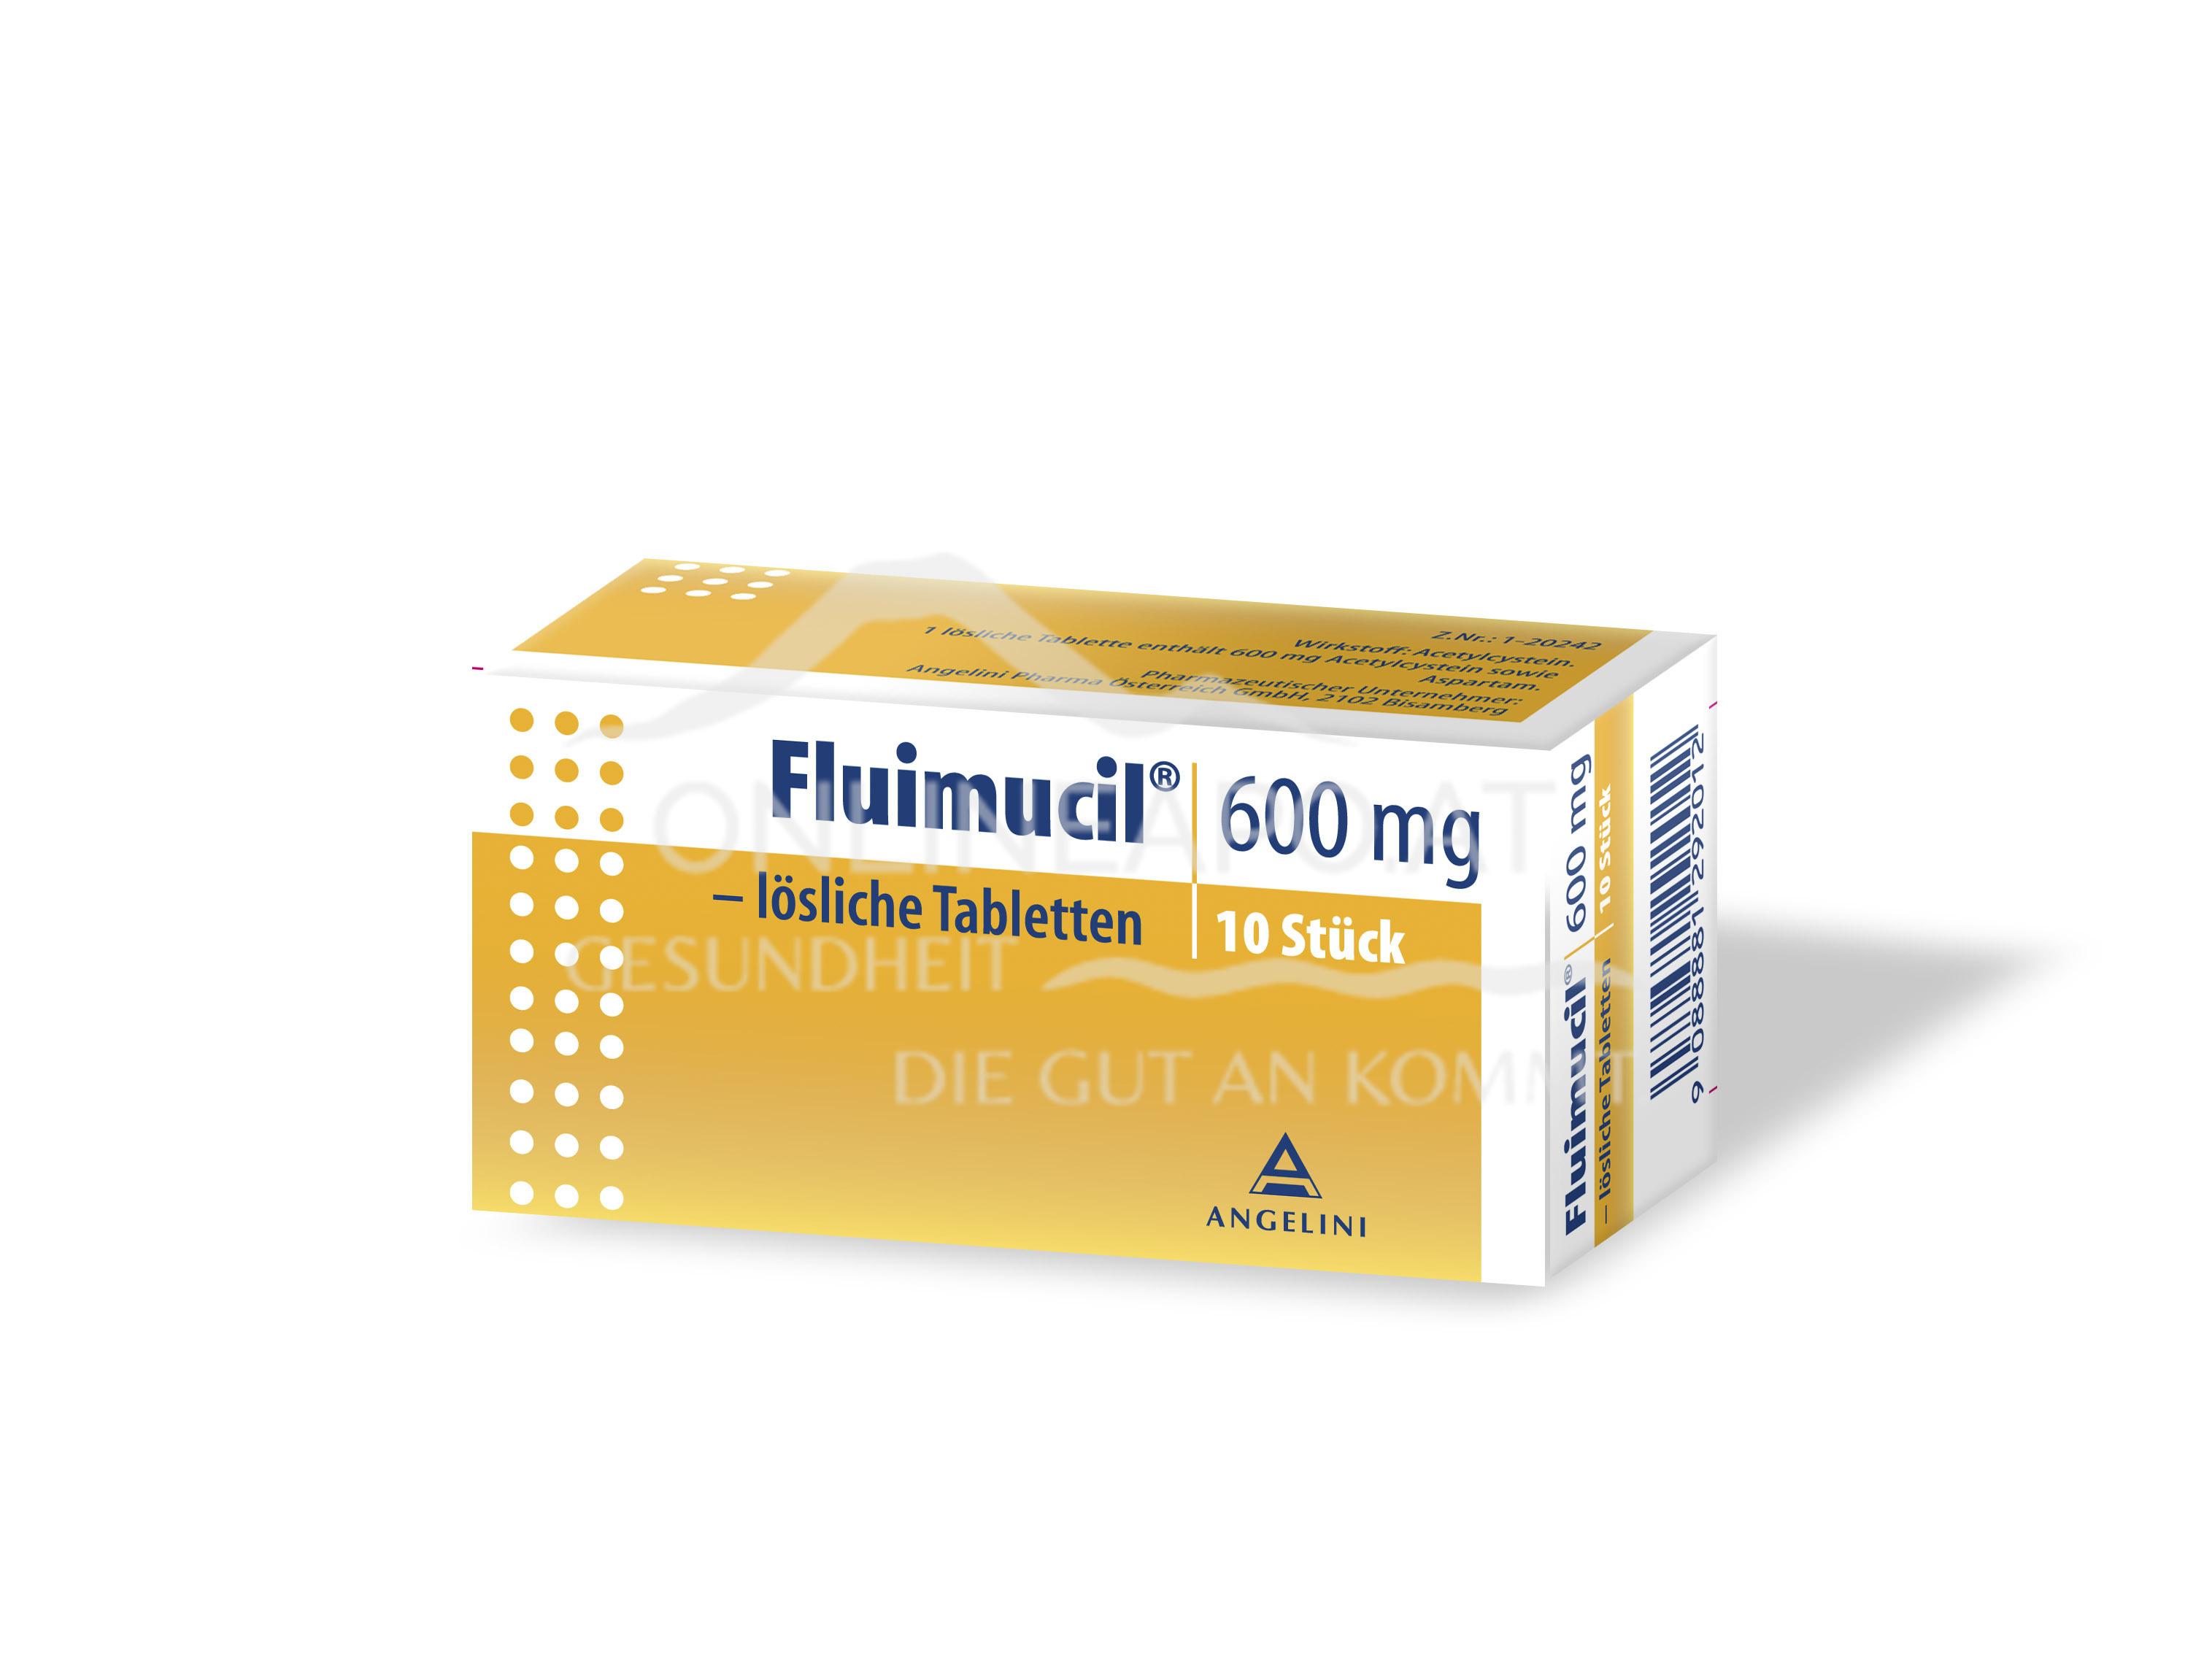 Fluimucil 600mg lösliche Tabletten